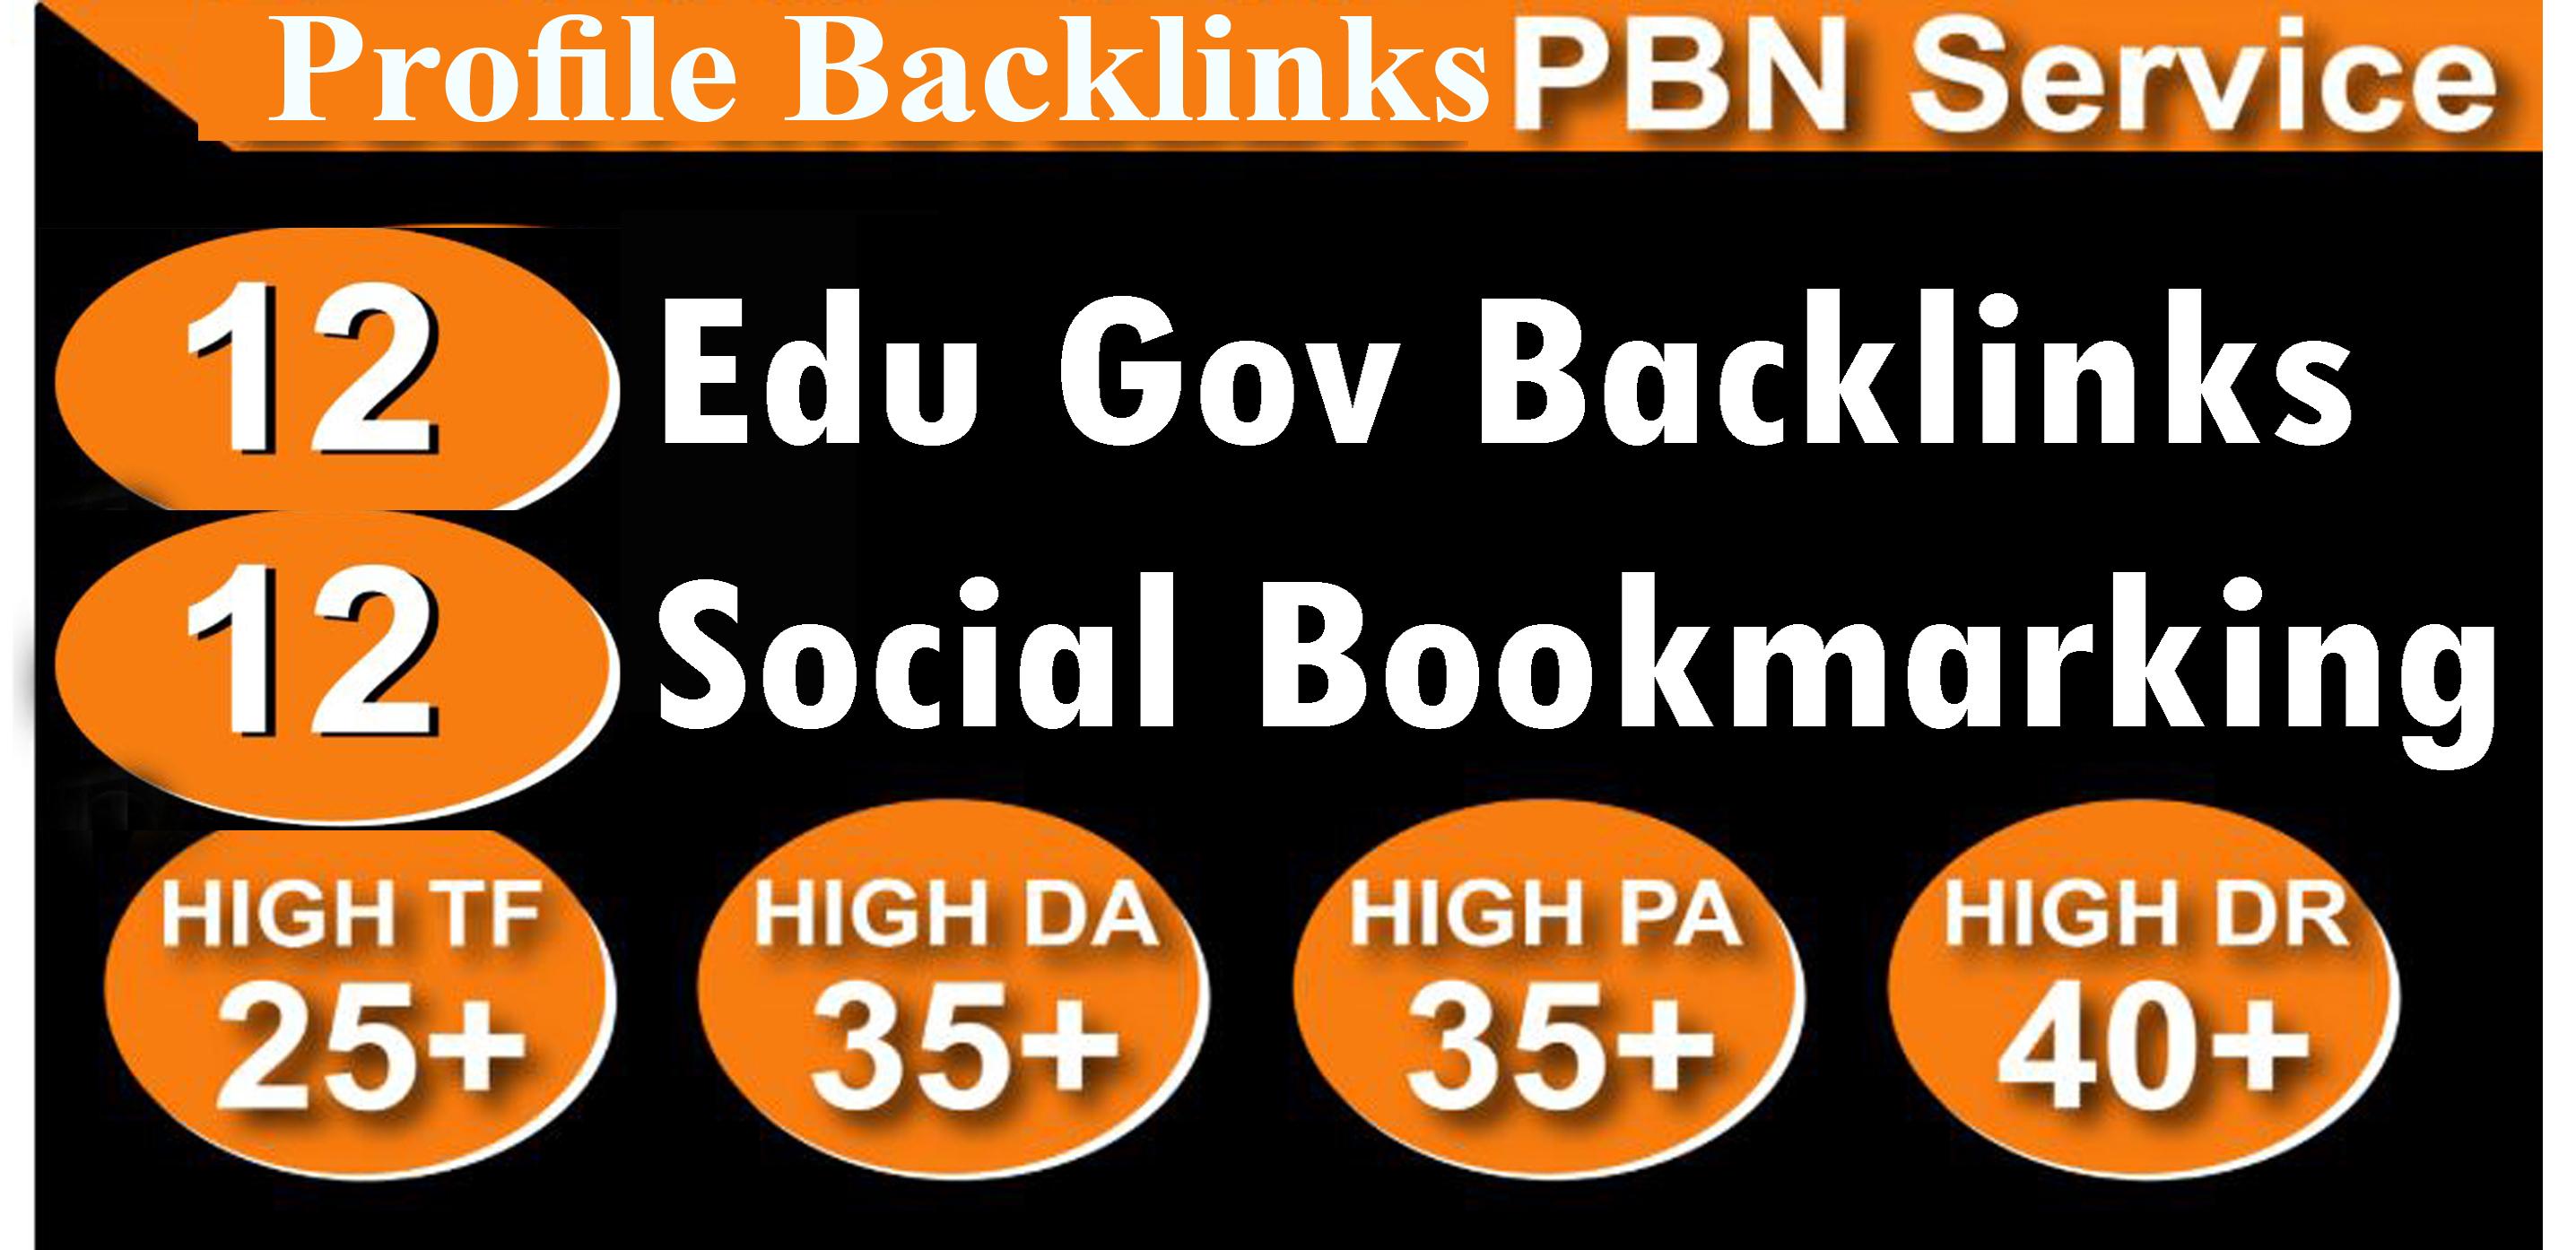 Create 12 Unique edu gov PBN Backlinks